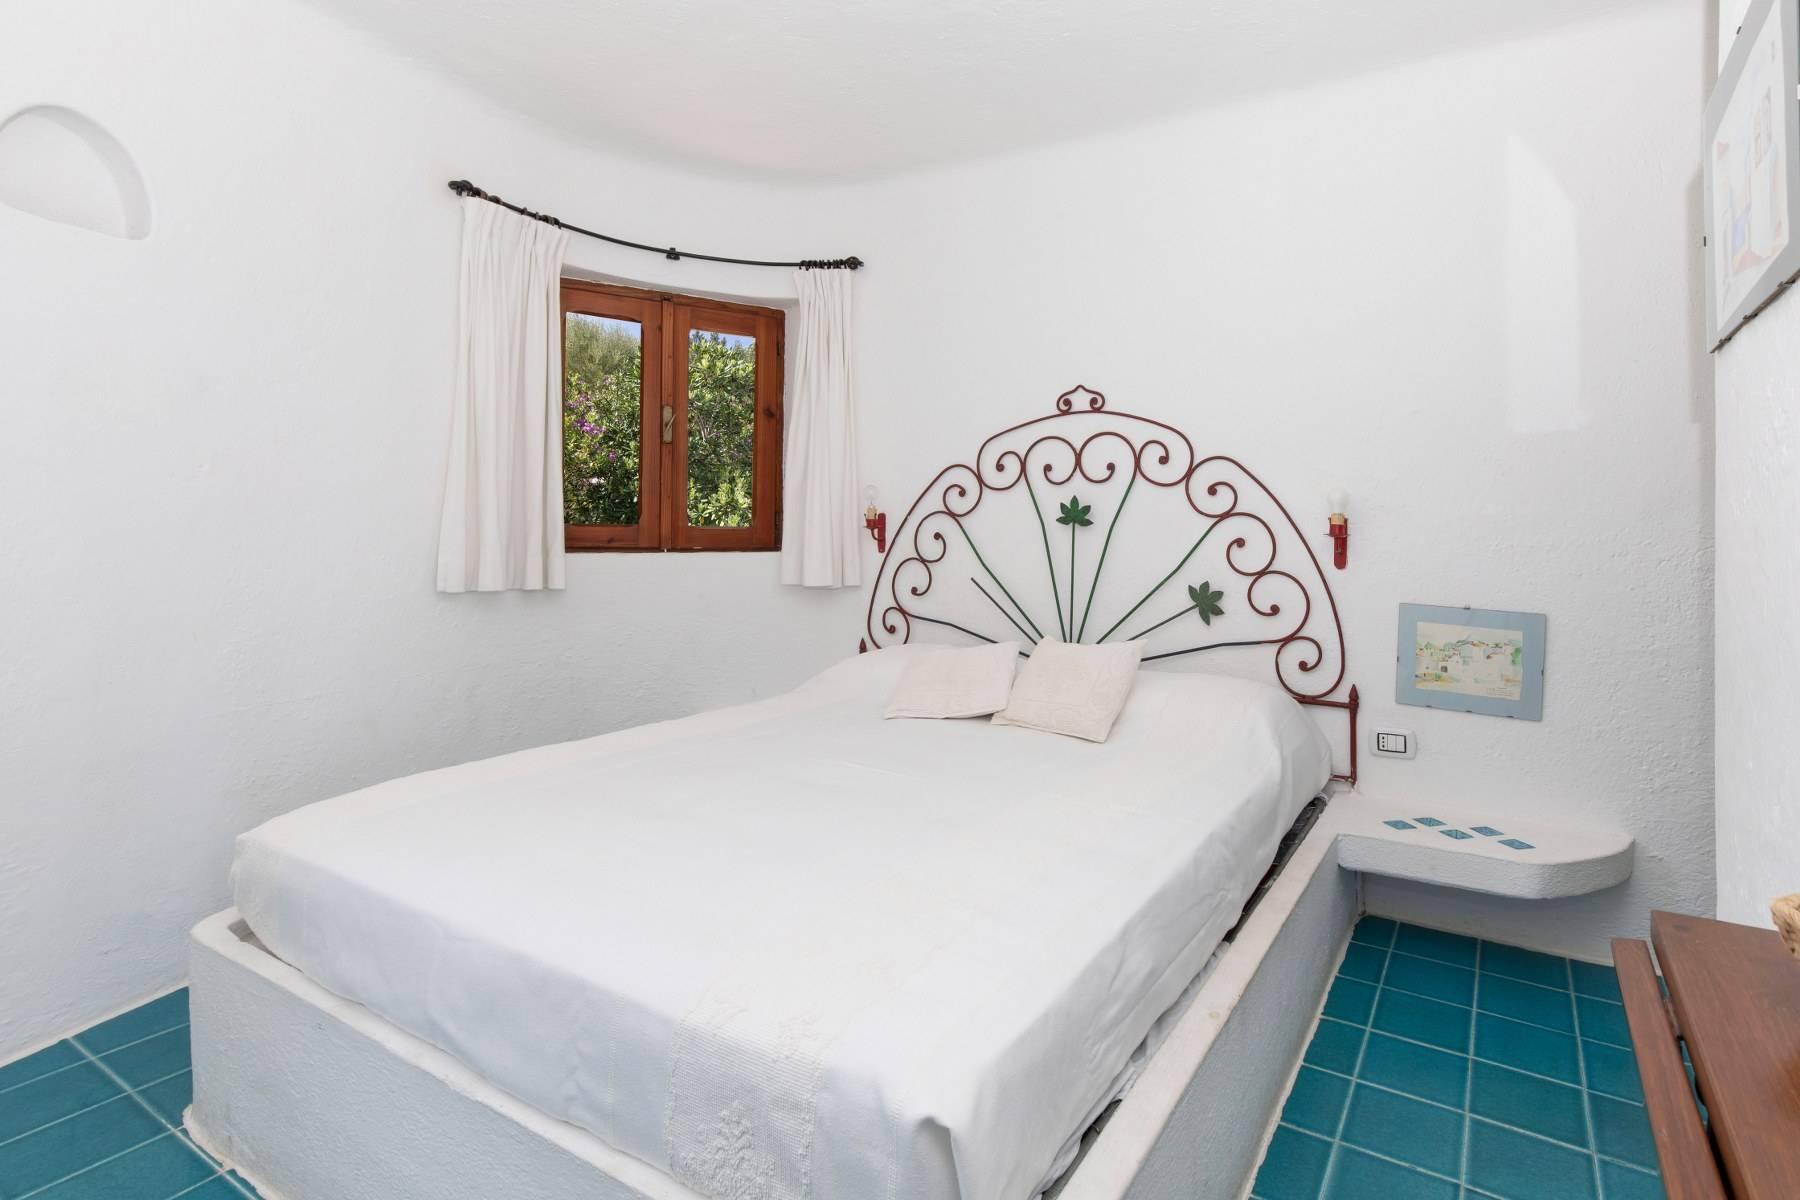 Appartamento in Vendita a Palau: 5 locali, 65 mq - Foto 19